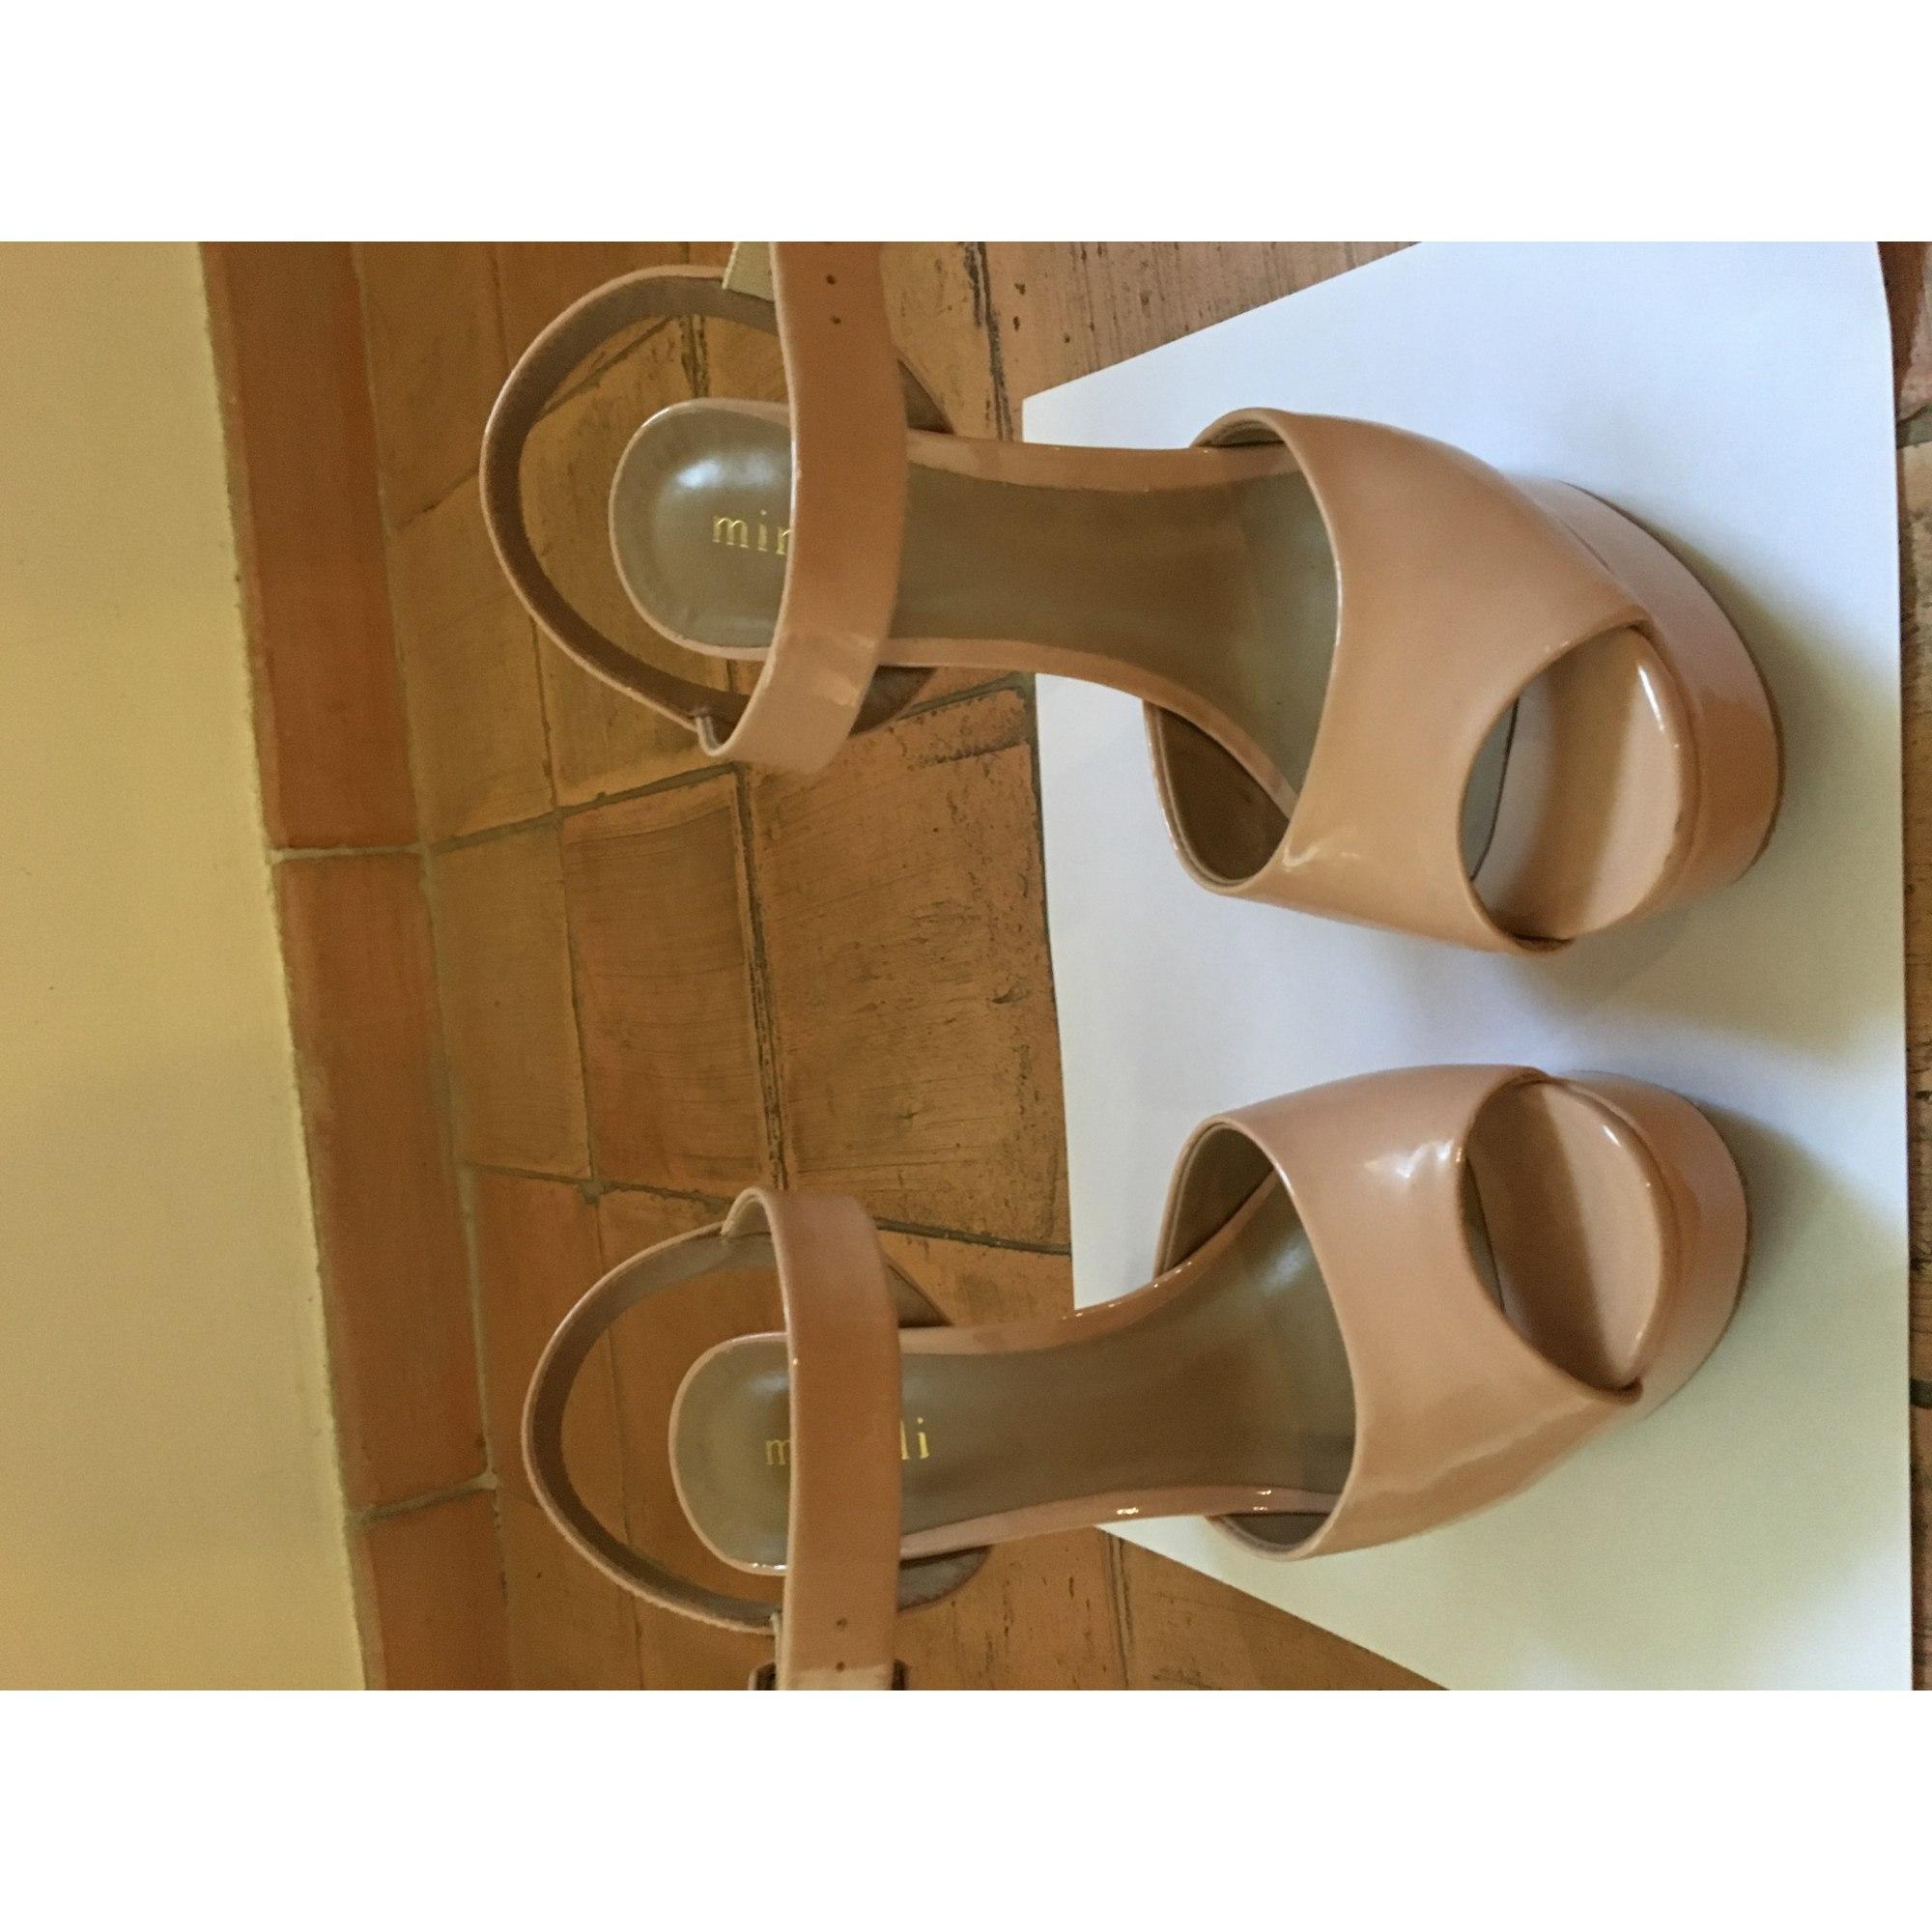 Minelli Sandales fuchsia ZALANDO.FR | Sandales à talons